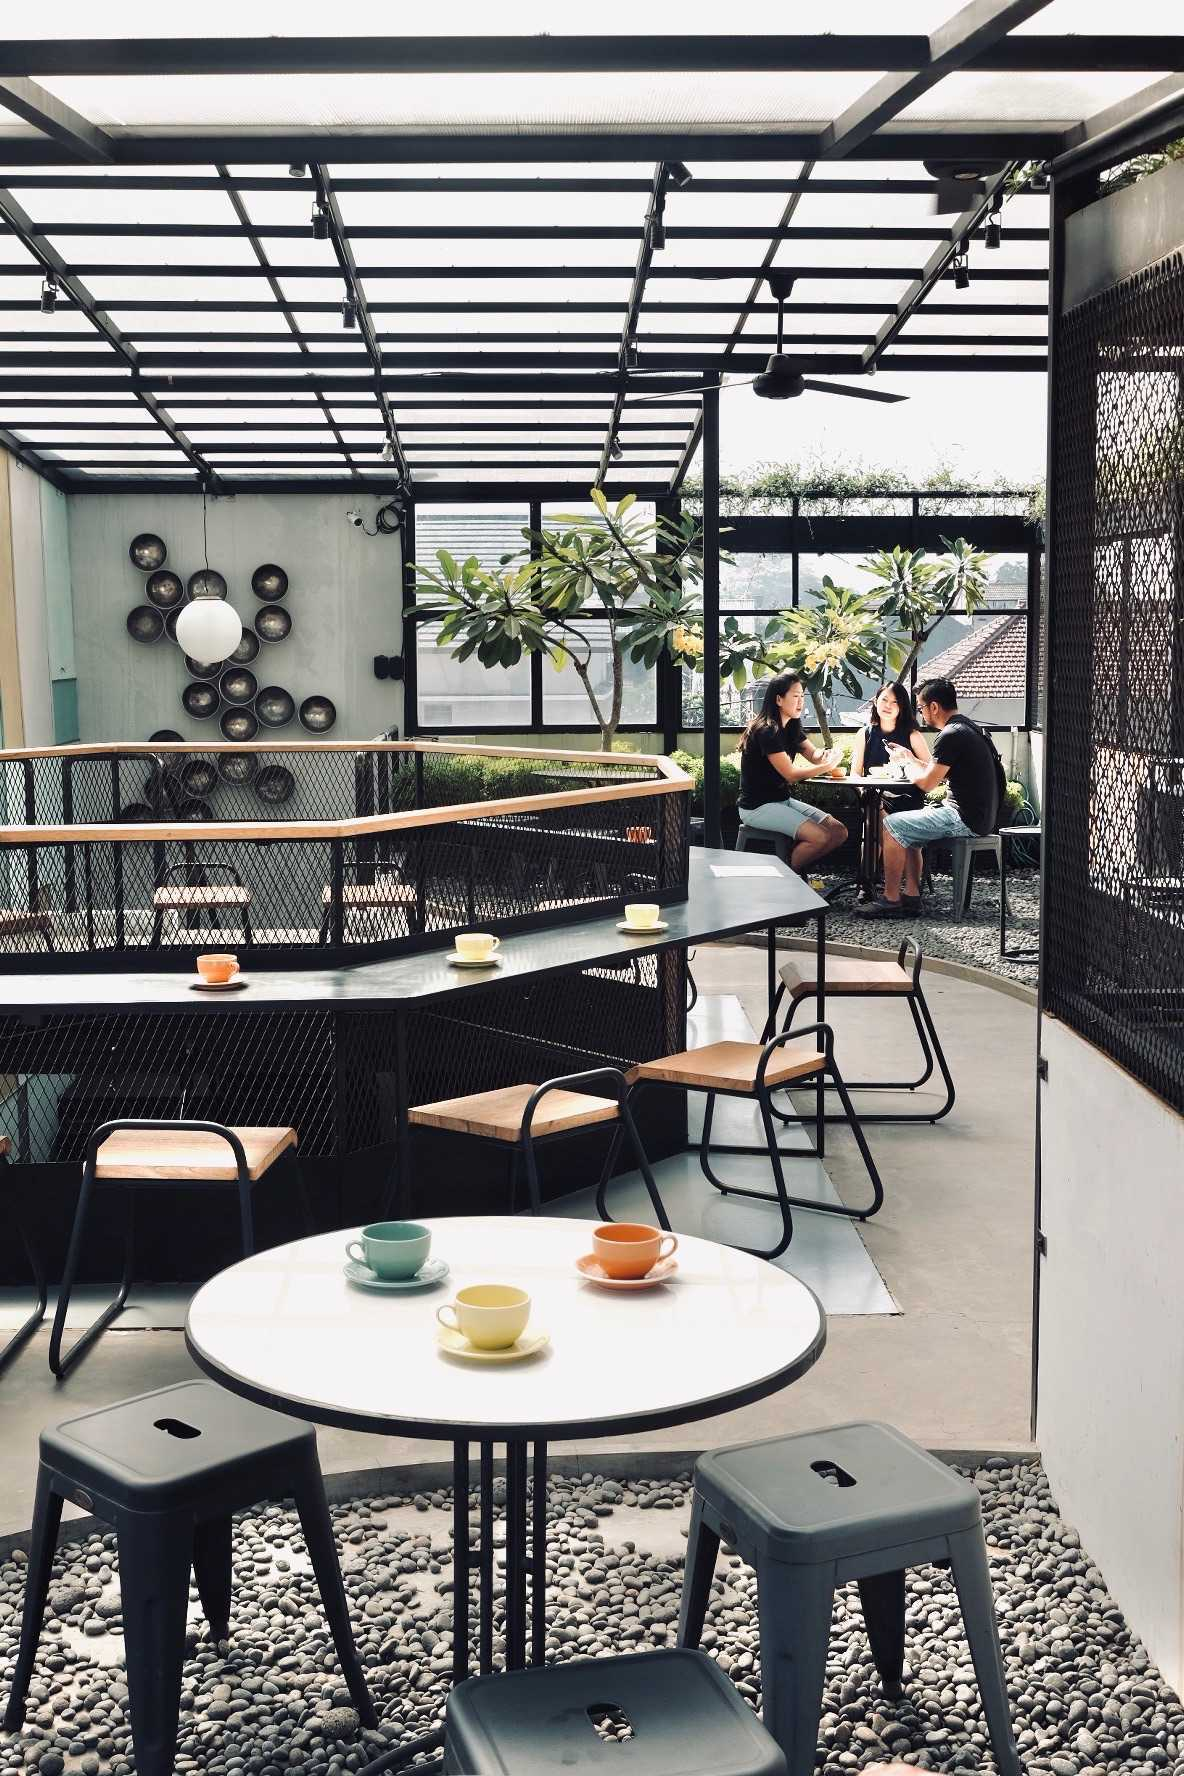 Dinardithen Studio Industrial Bakery House And Coffe At Paskal Bandung, Kota Bandung, Jawa Barat, Indonesia Bandung, Kota Bandung, Jawa Barat, Indonesia Dinardithen-Studio-Industrial-Bakery-House-And-Coffe-At-Paskal  127168